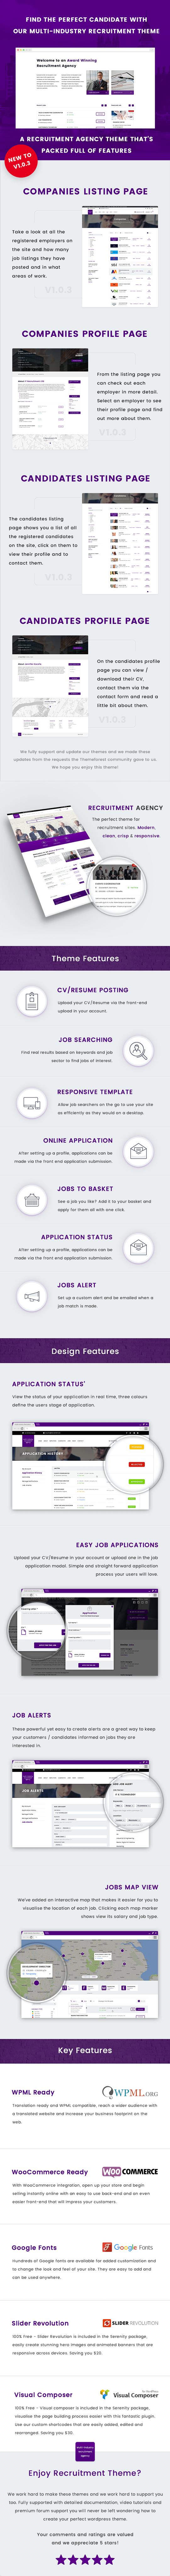 Recruitment Agency - Multi Industry Responsive WordPress Theme - 5